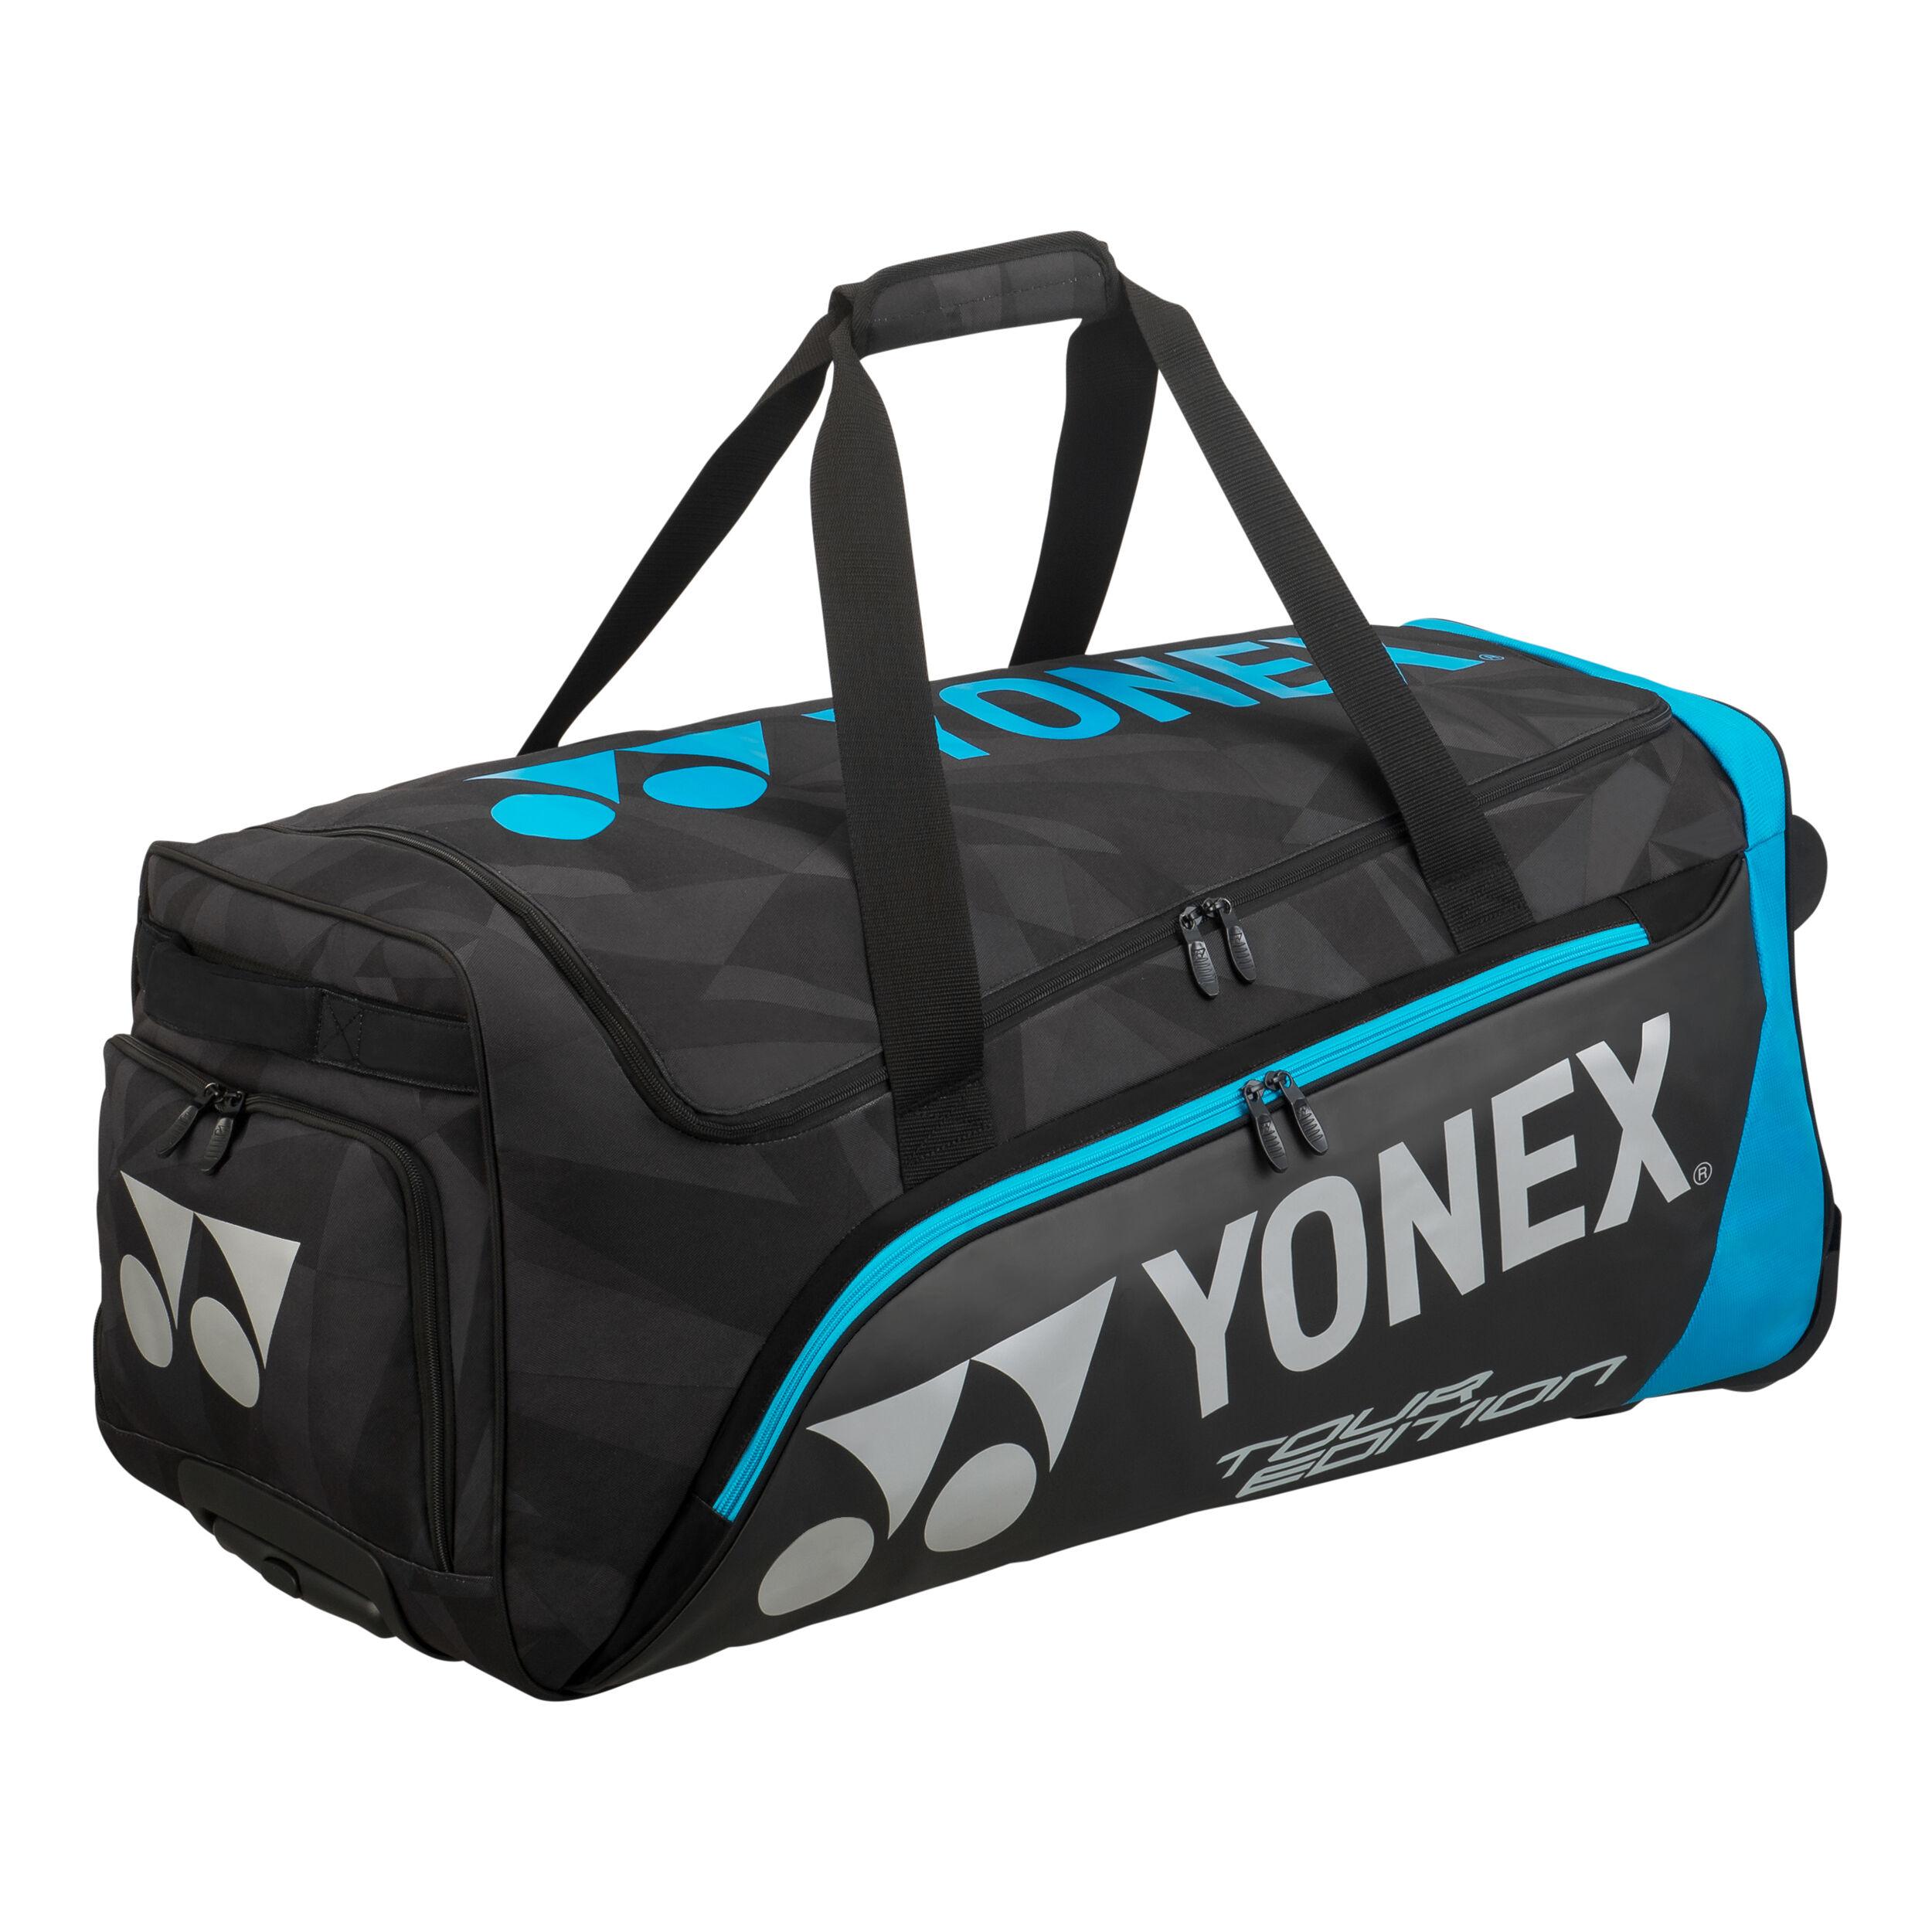 Trolley SchwarzBlau Bag Reisetasche Yonex Pro v8wNm0On